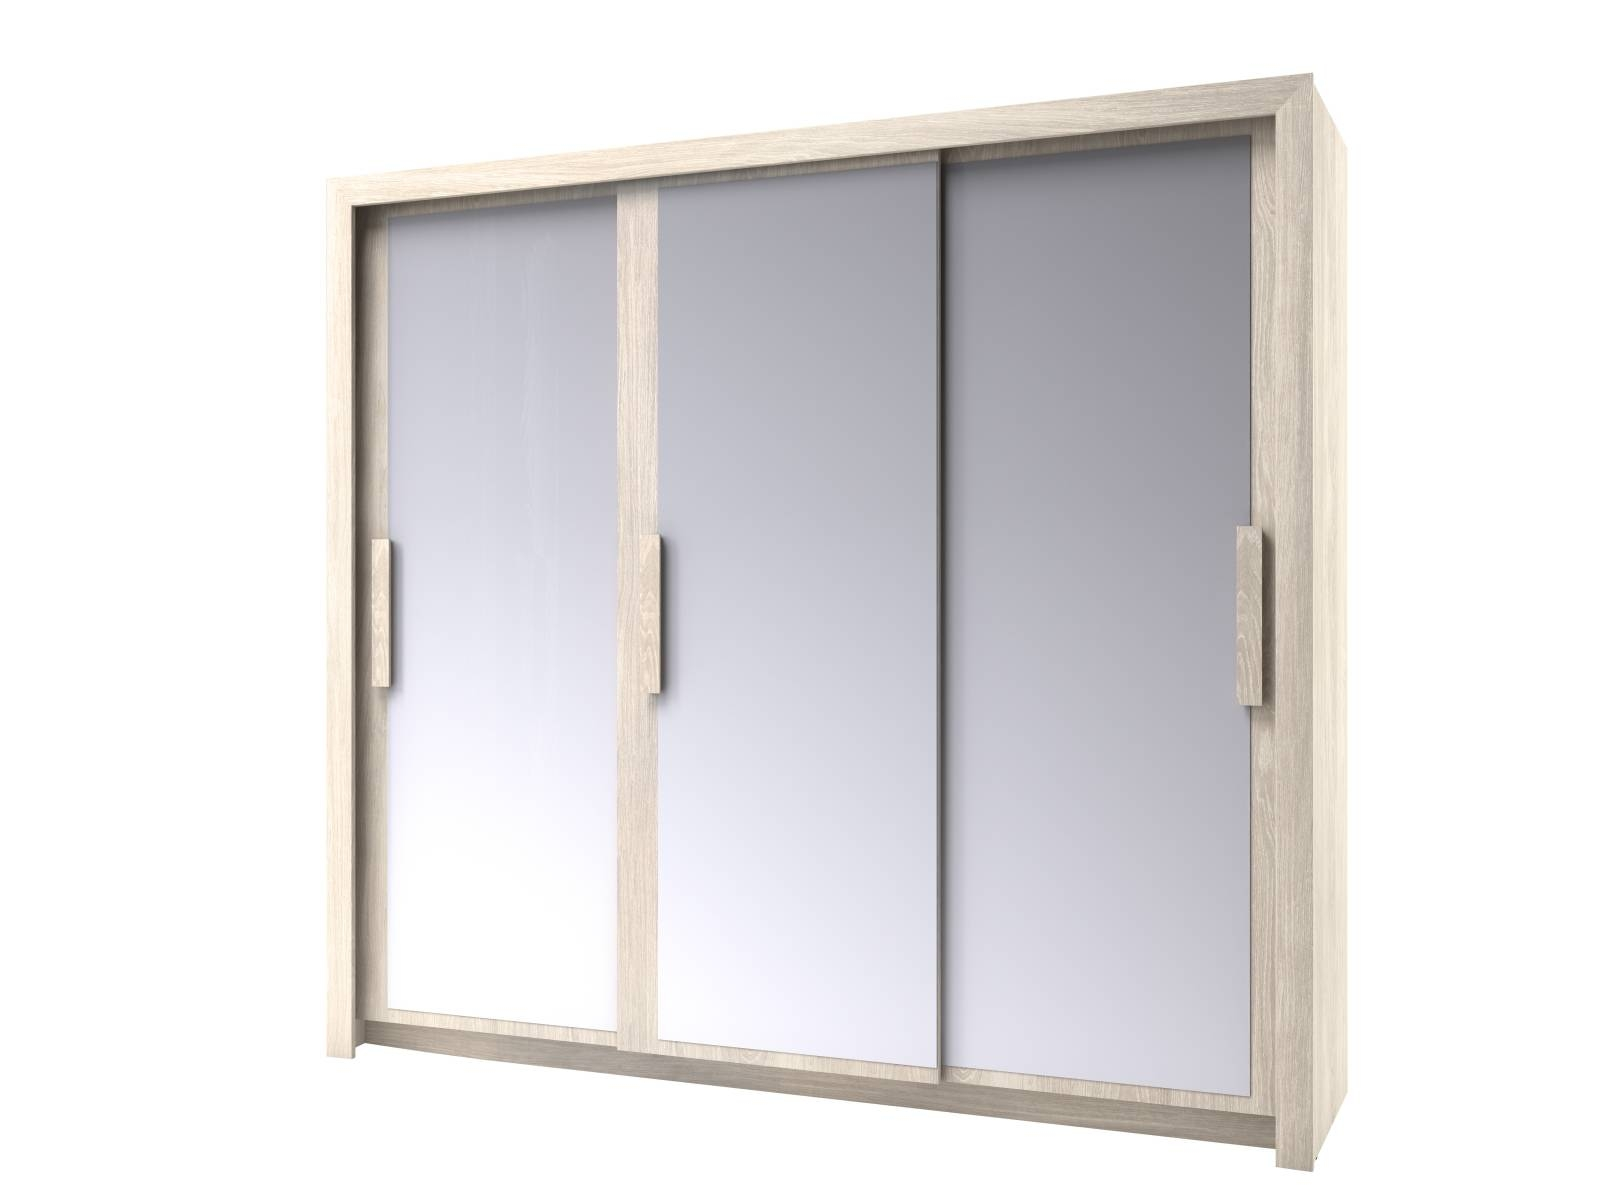 Chenin 3 Door Mirrored Wardrobe (Light Oak) | All Ranges | Cousins regarding Three Door Mirrored Wardrobes (Image 7 of 15)